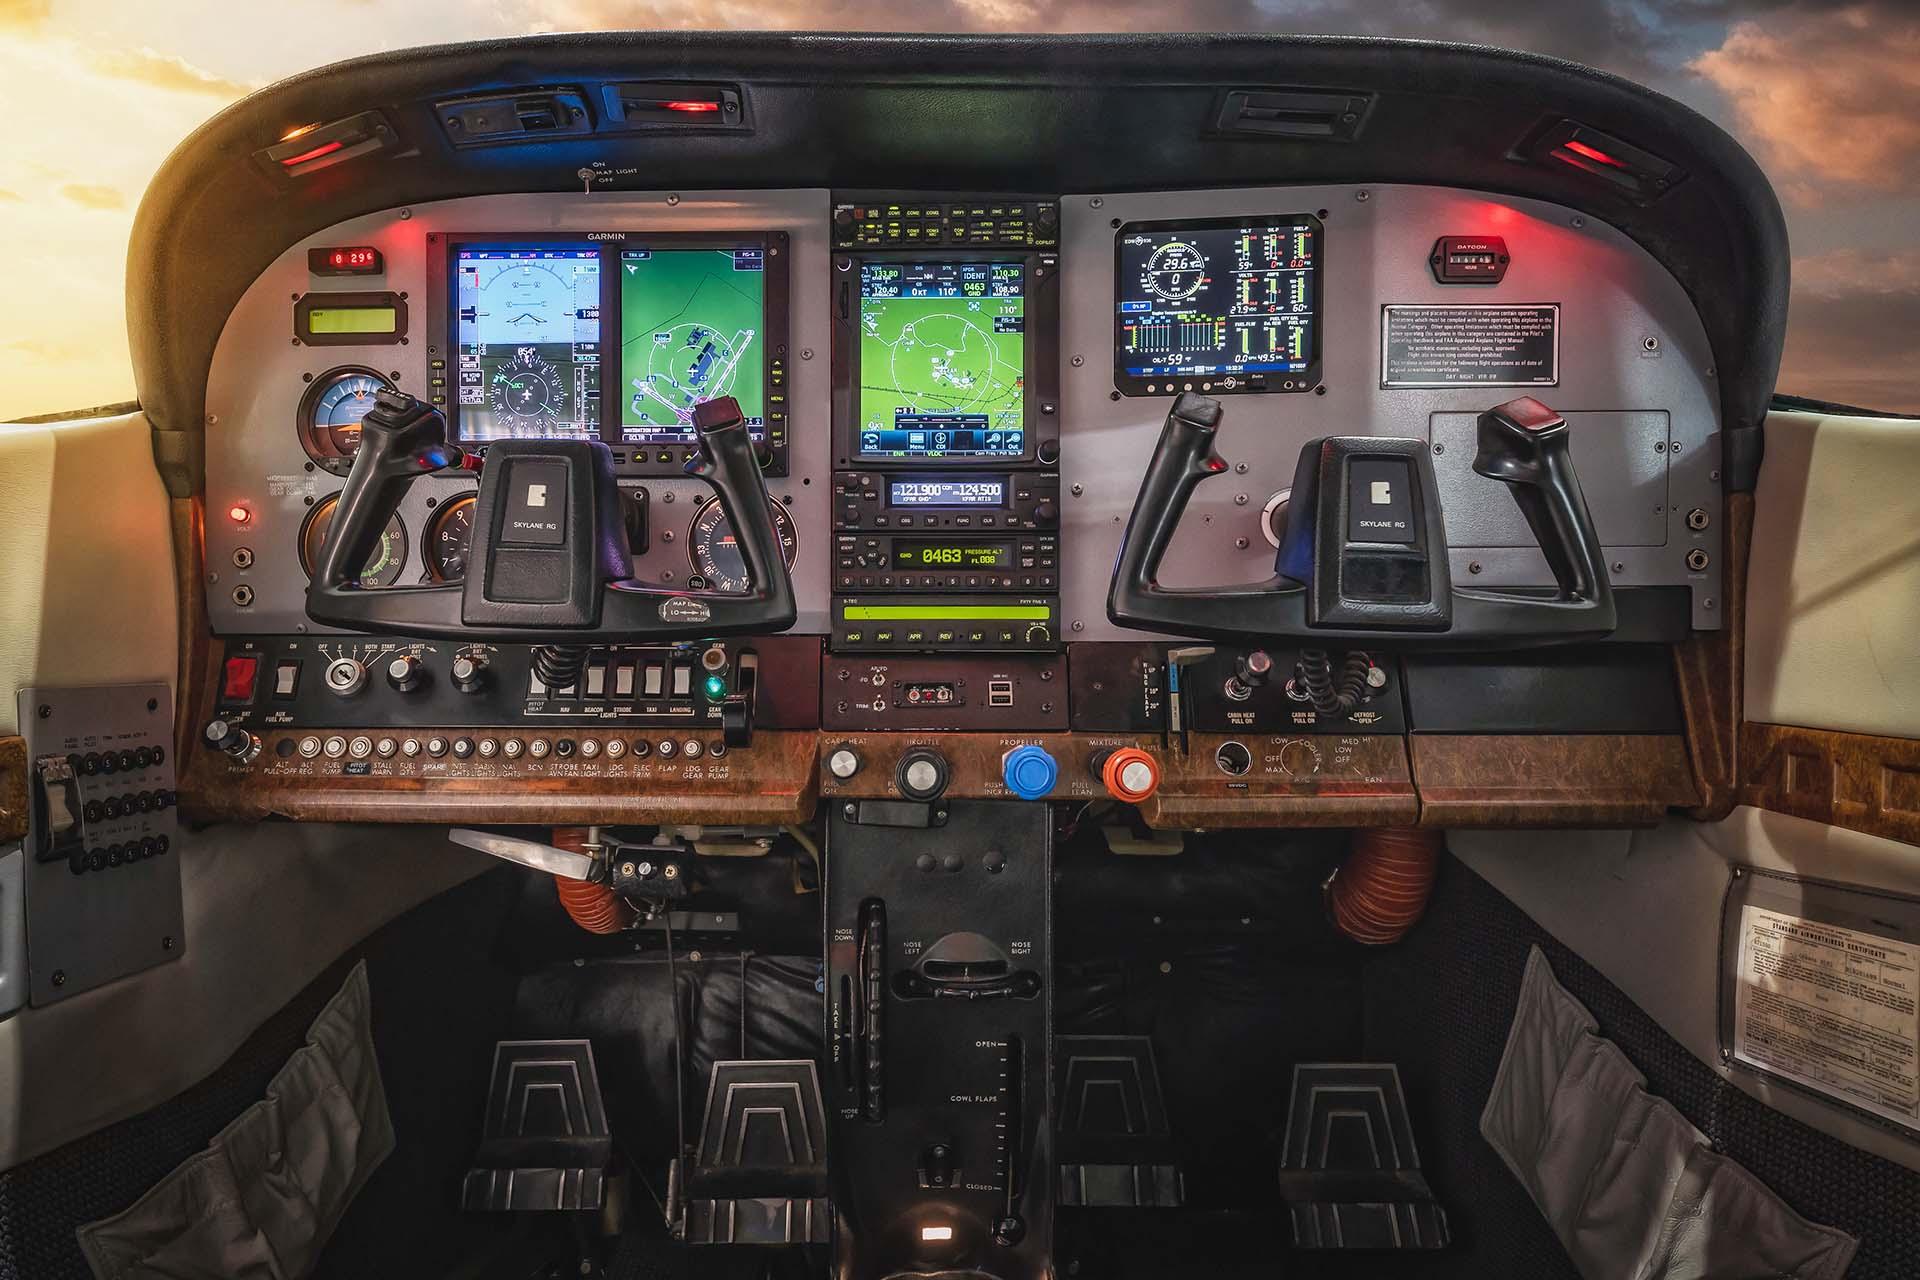 20201207_FJC-Cockpits_jalanpaul_DSC09643_N7150S_WEB